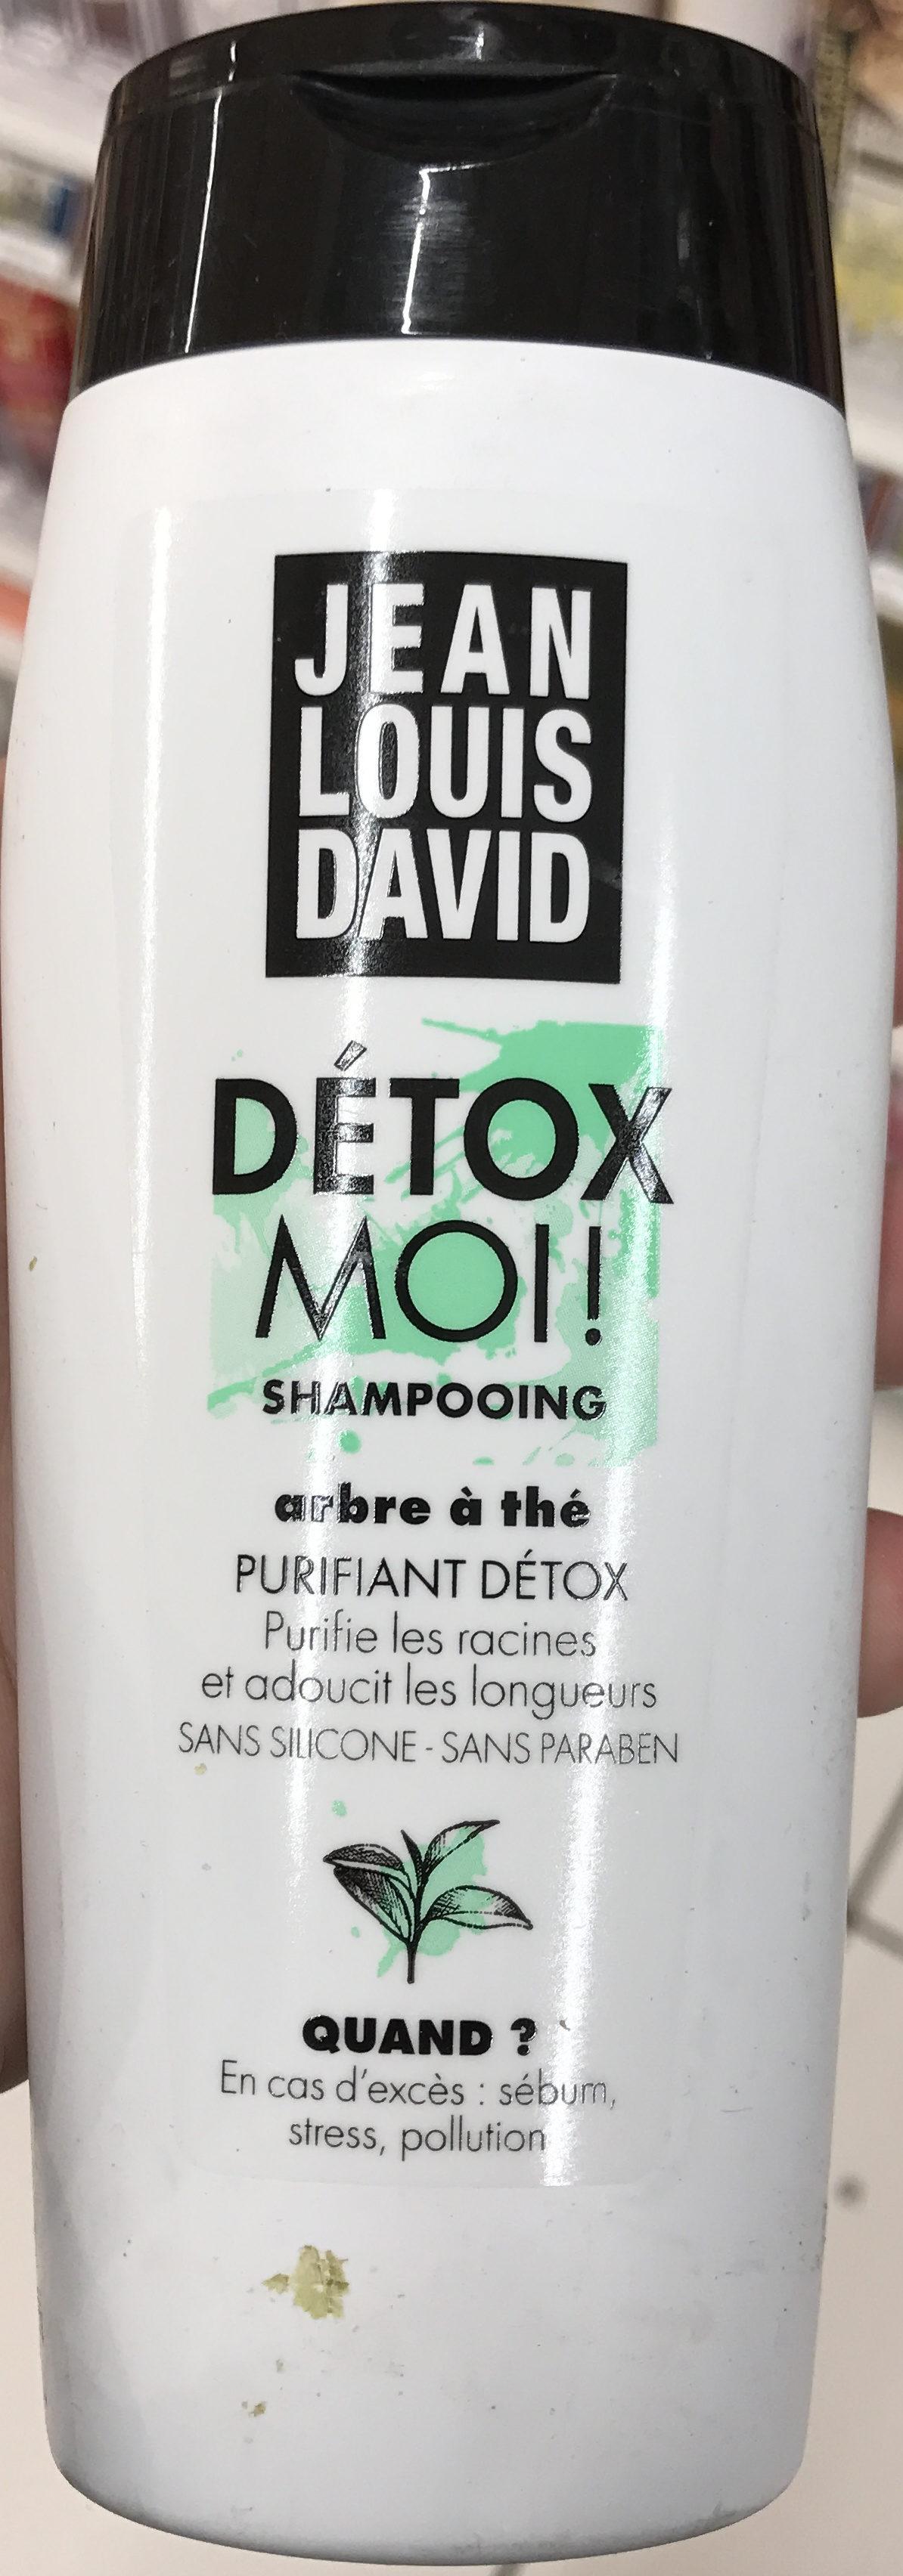 Détox Moi! Shampooing - Produit